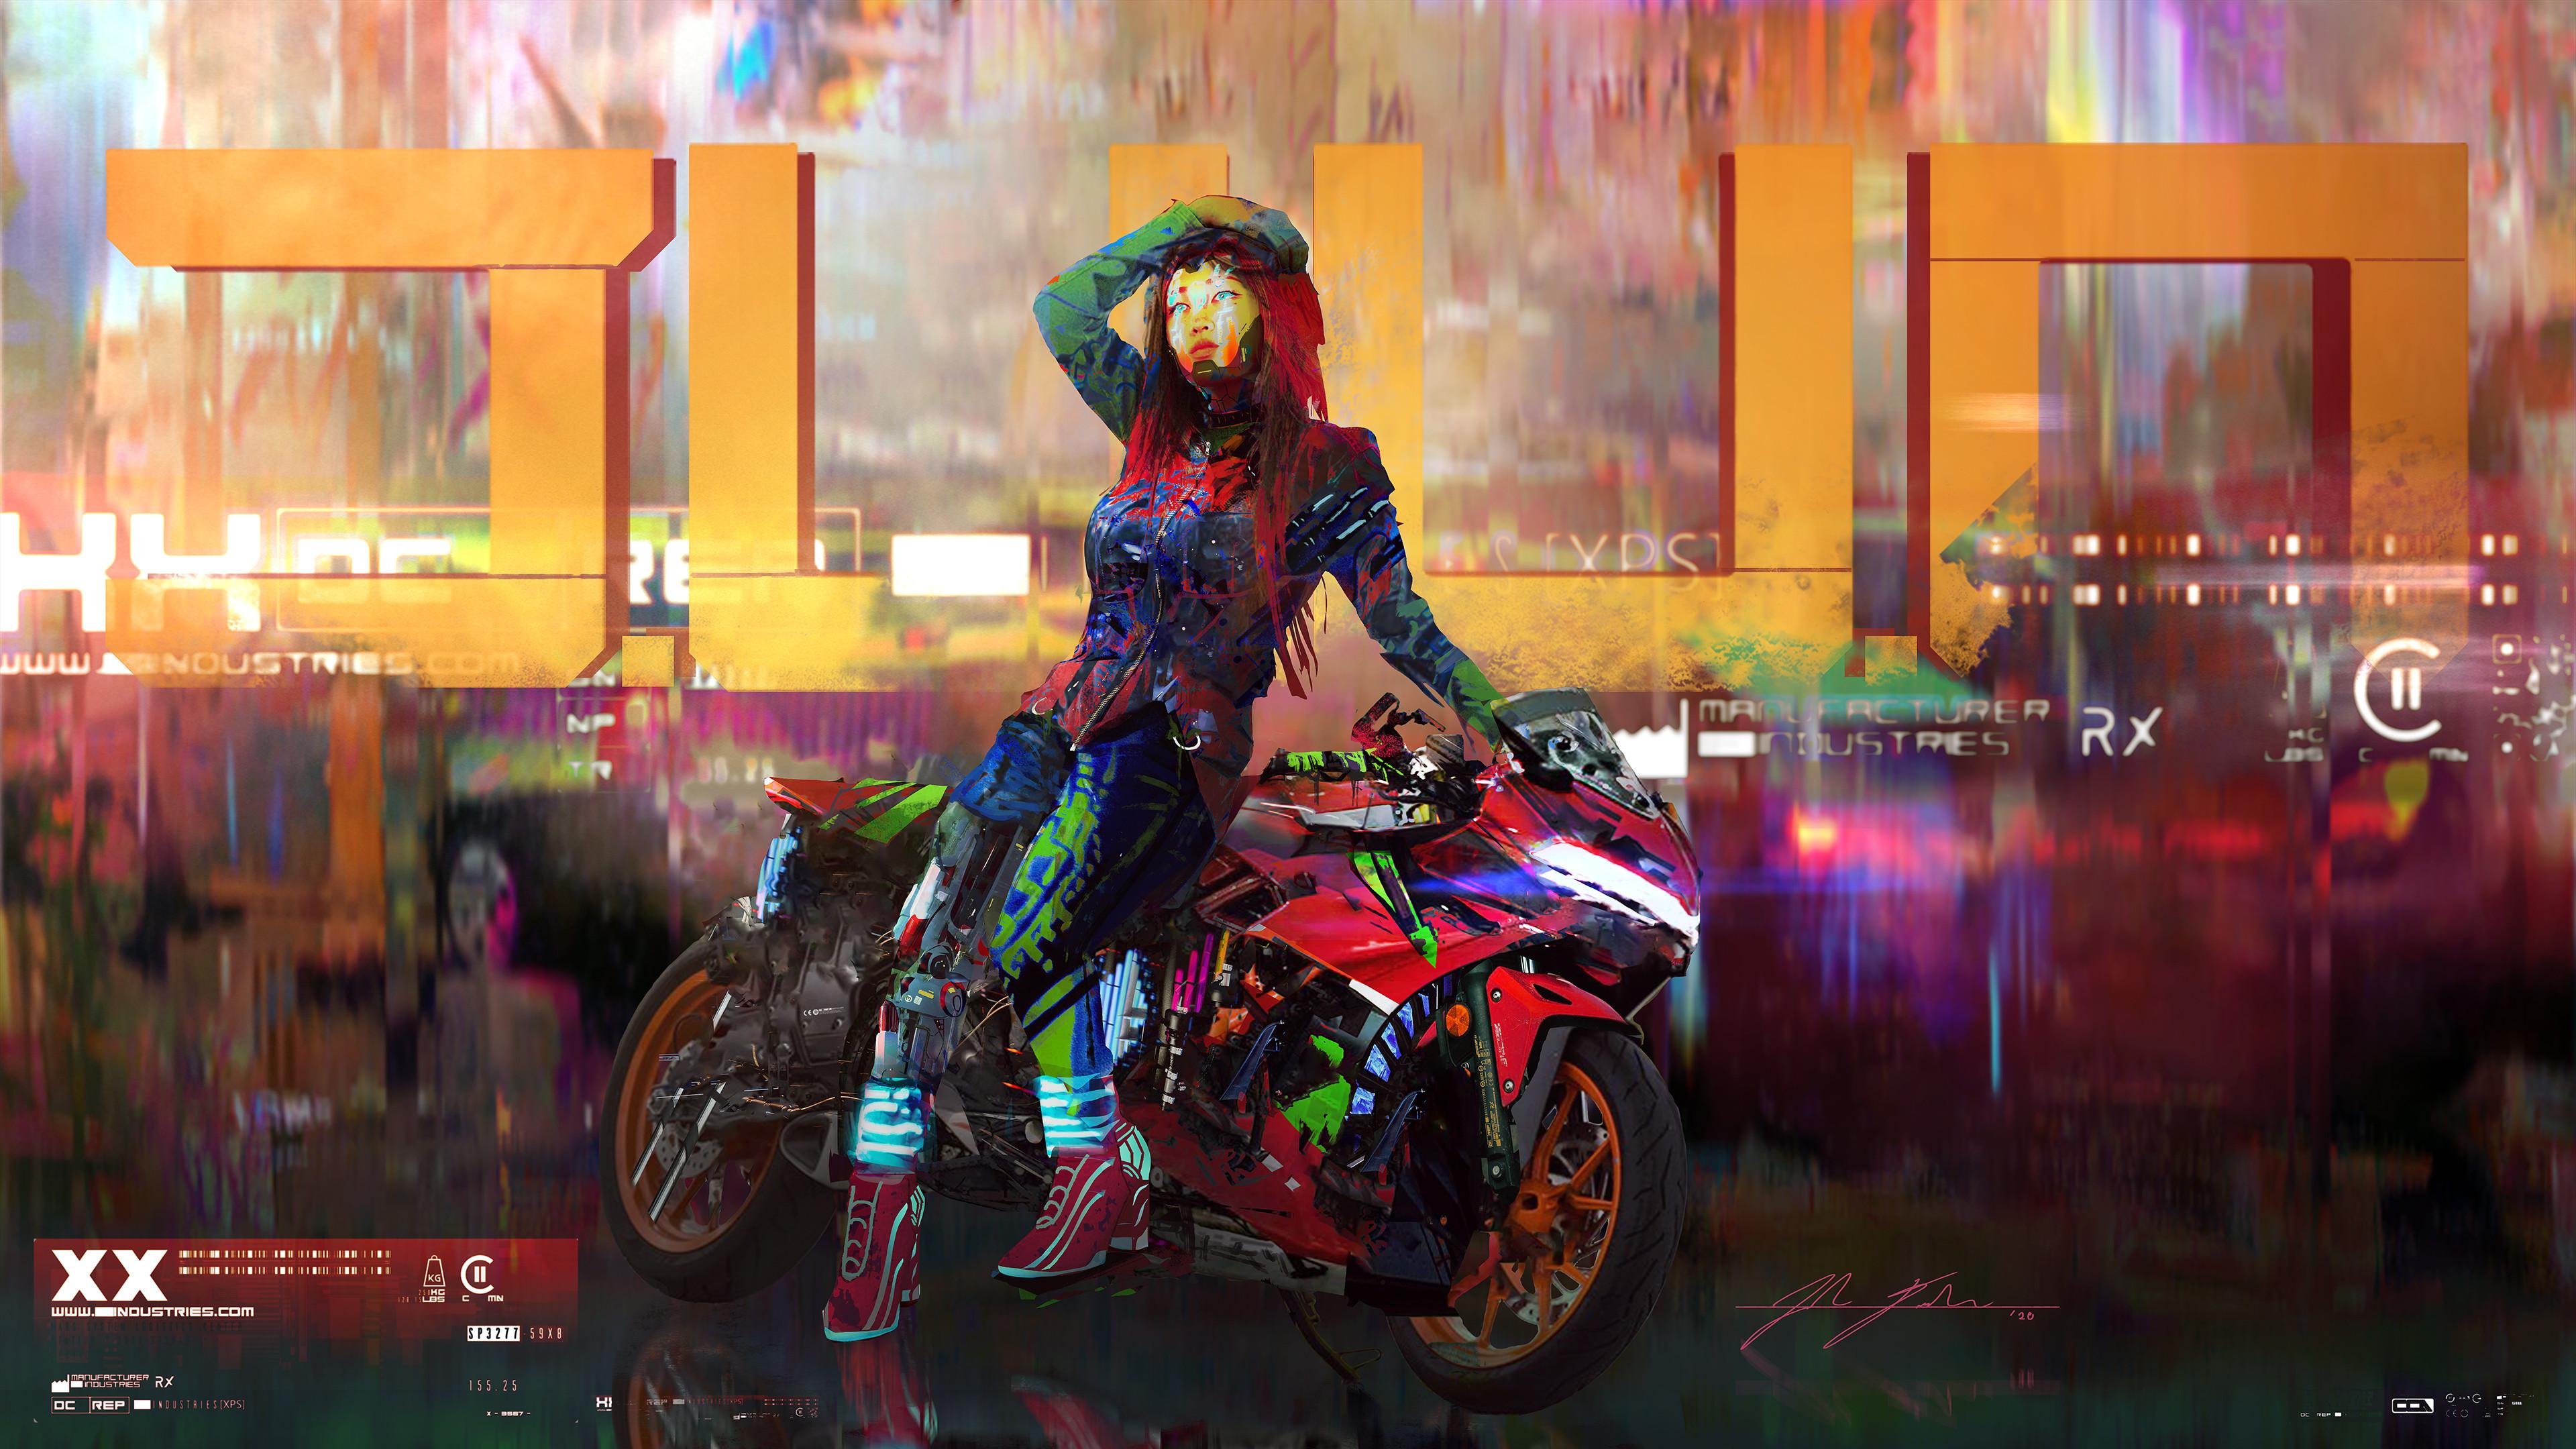 General 3840x2160 Josh Durham cyborg video games women digital painting fan art motorcycle digital art hand on head cyberpunk video game art Cyberpunk 2077 artwork colorful video game girls ArtStation